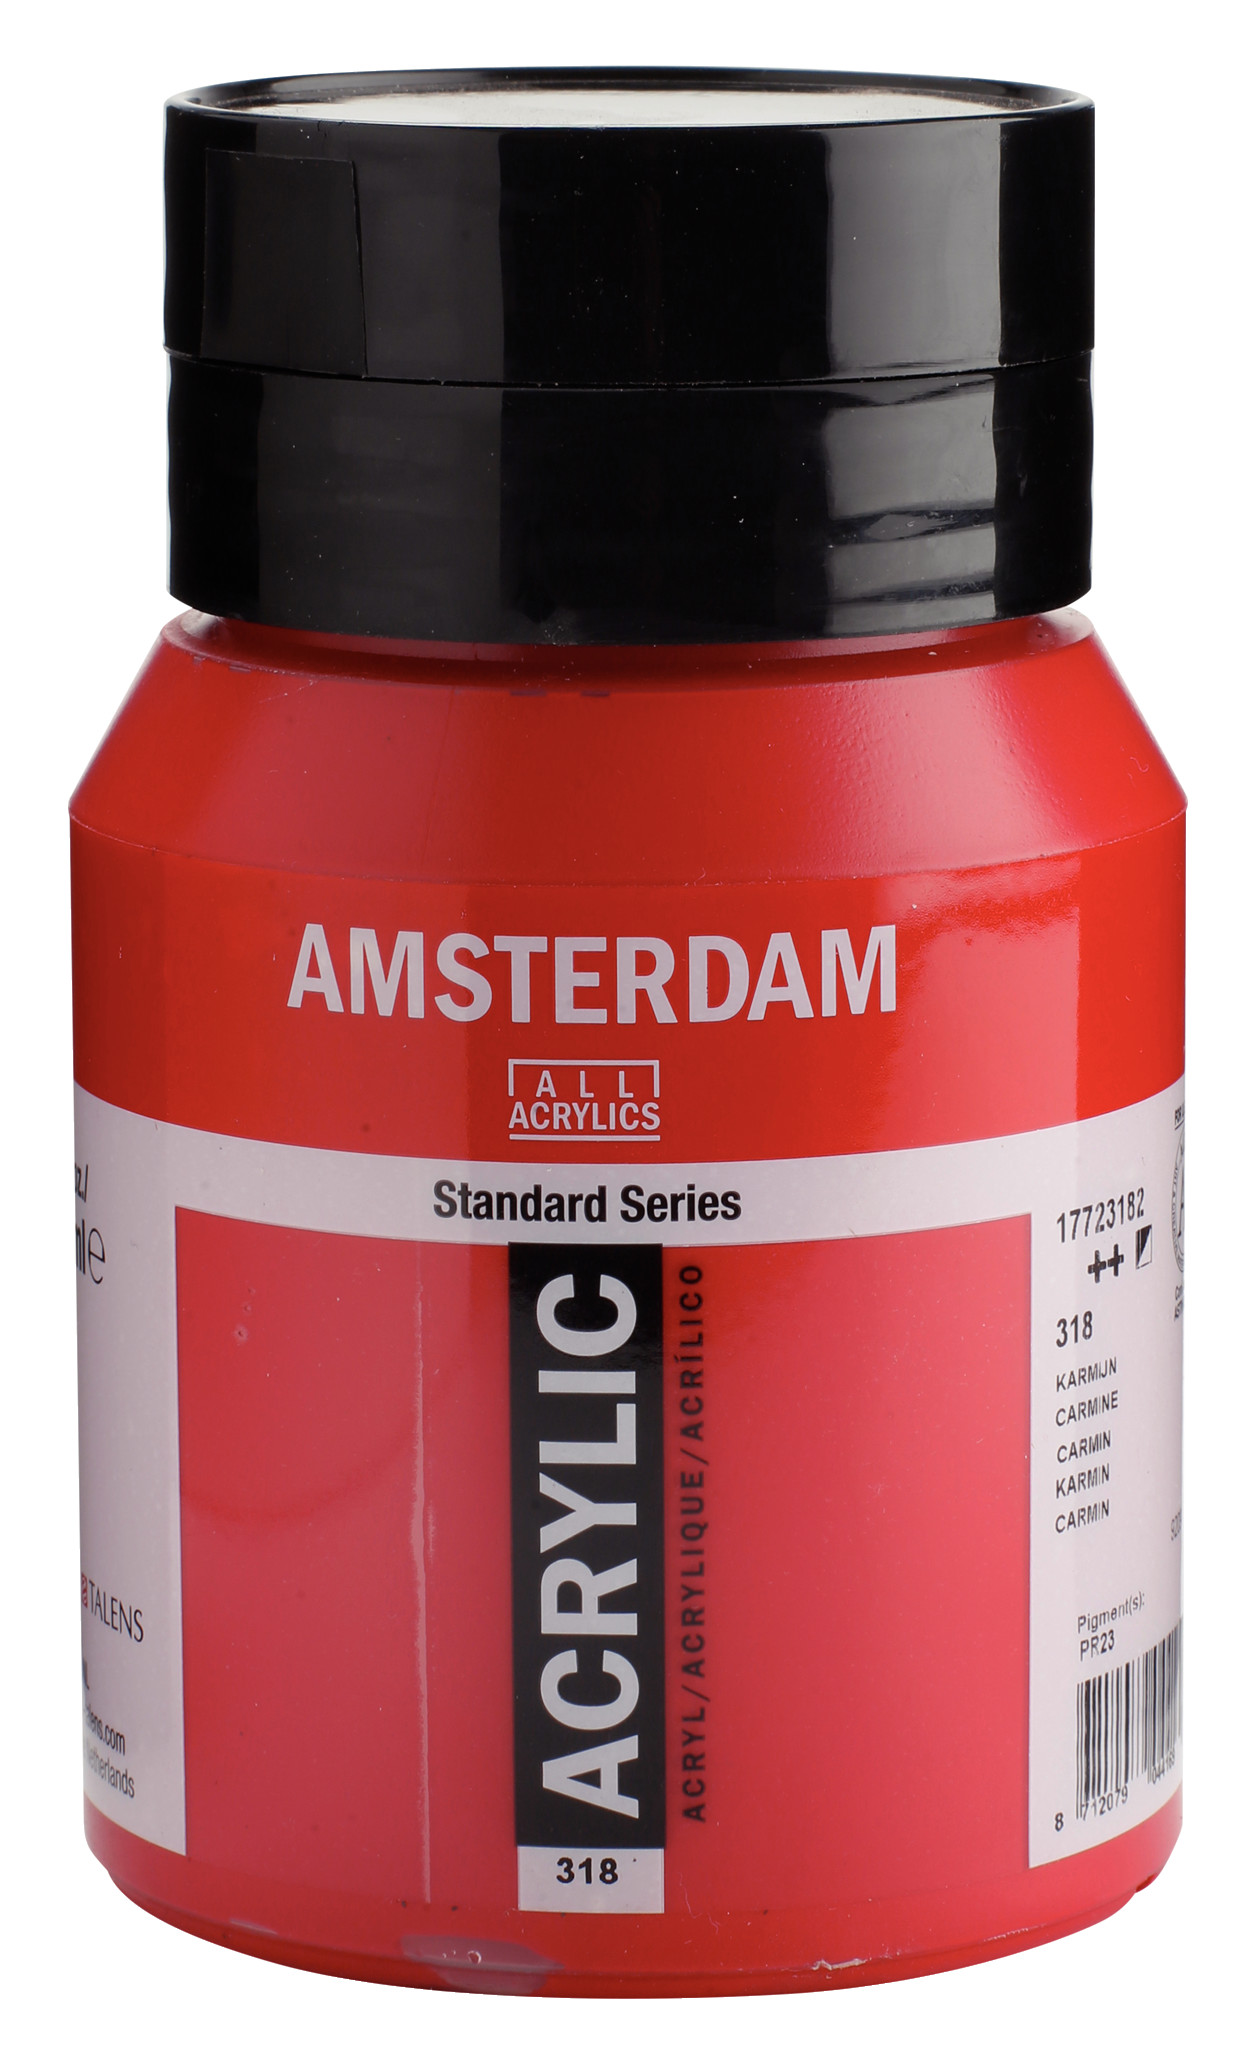 Amsterdam Standard Series Acrylic Jar 500 ml Carmine 318